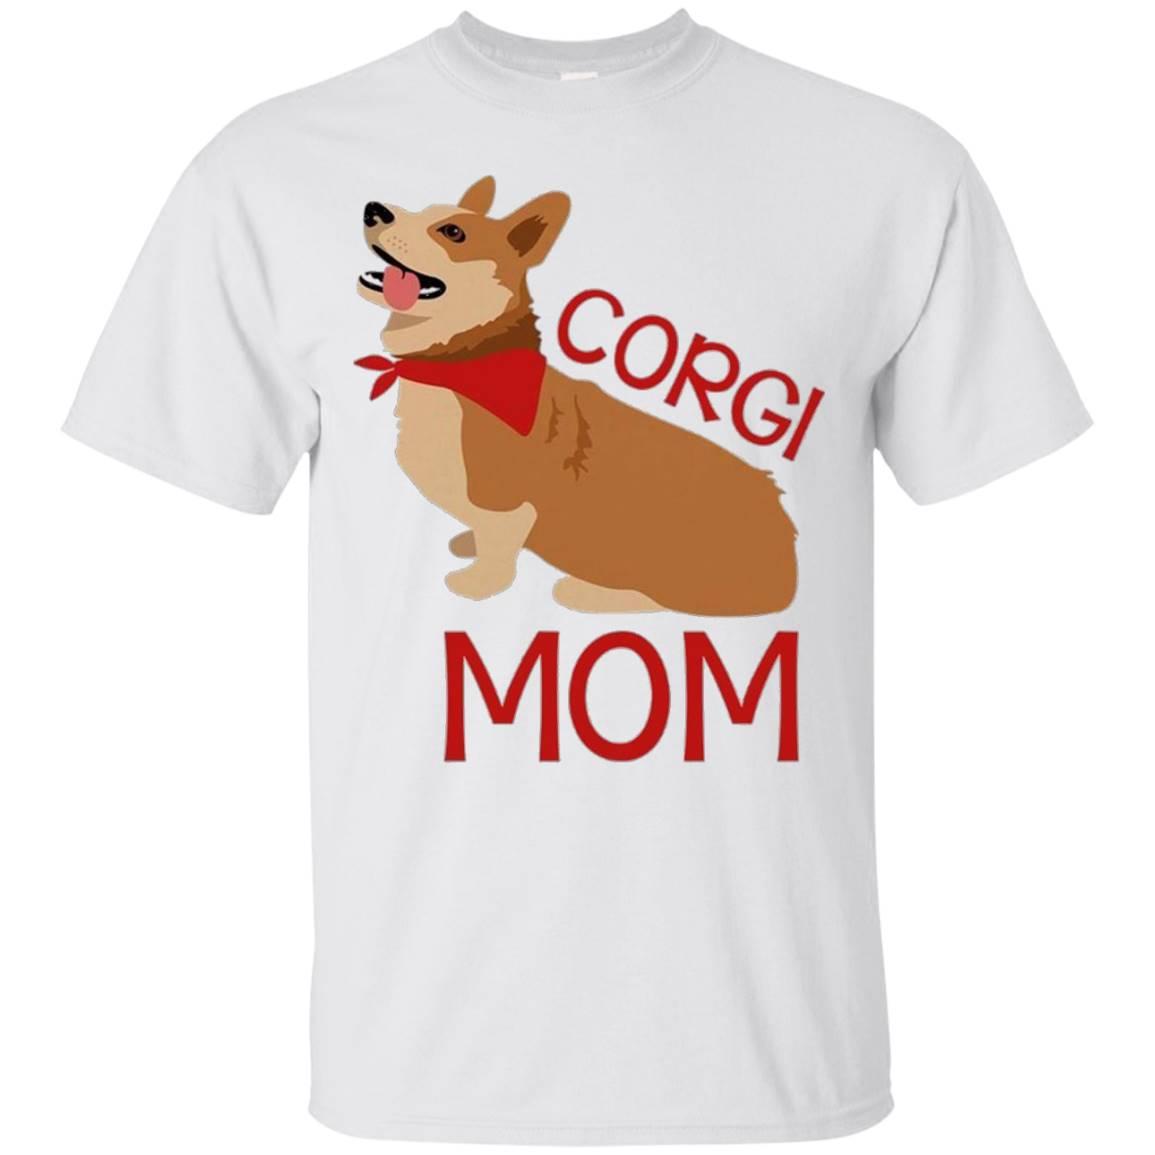 Corgi Mom – T-Shirt